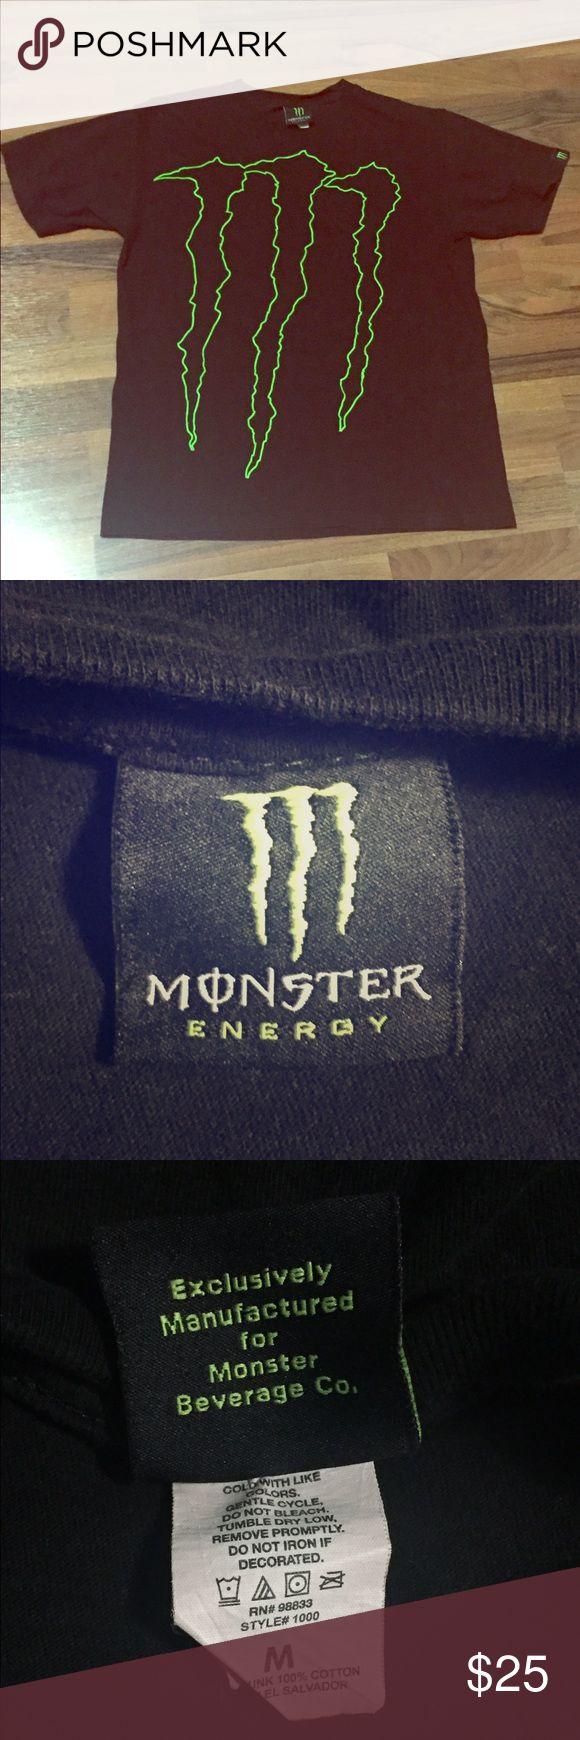 Monster Energy | Logo Tee Authentic Monster Energy Brand Ambassador Menu0027s  Medium Preshrunk 100% Cotton